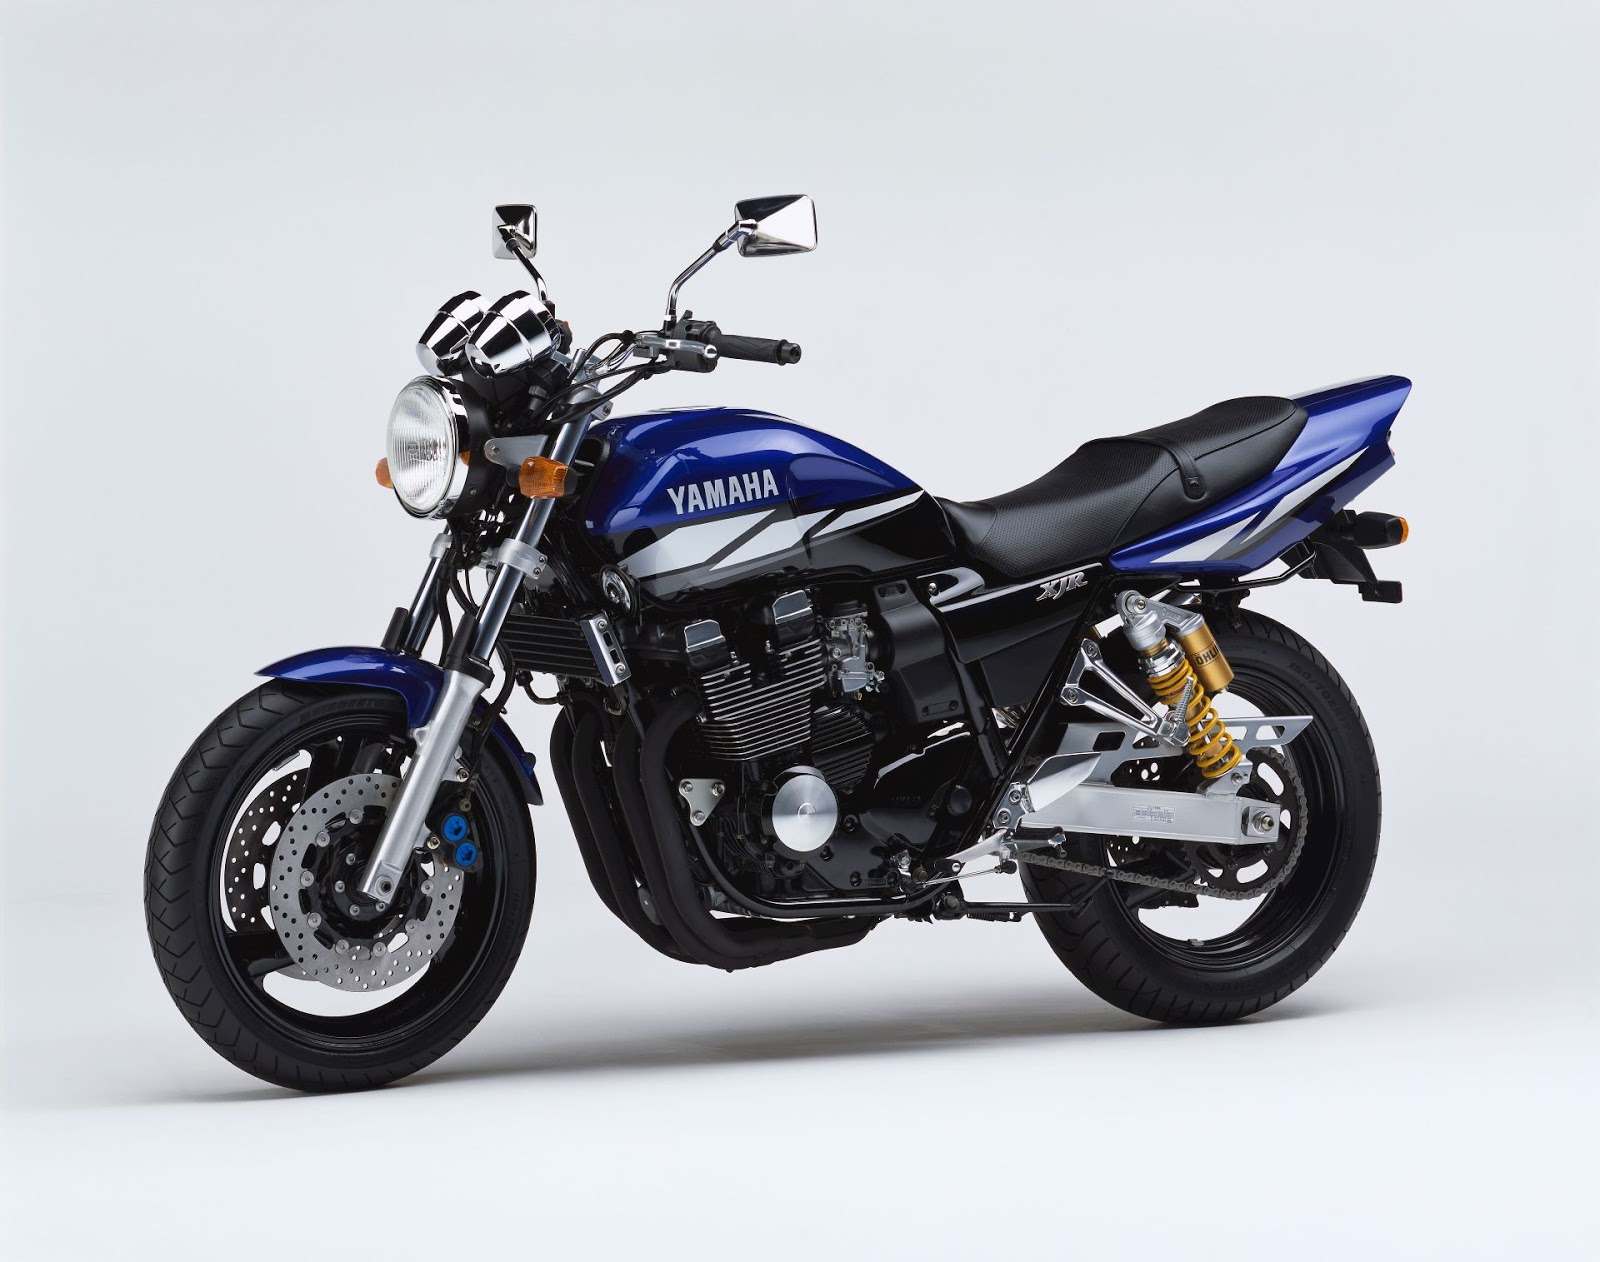 Planet Japan Blog: Yamaha XJR 400 2003